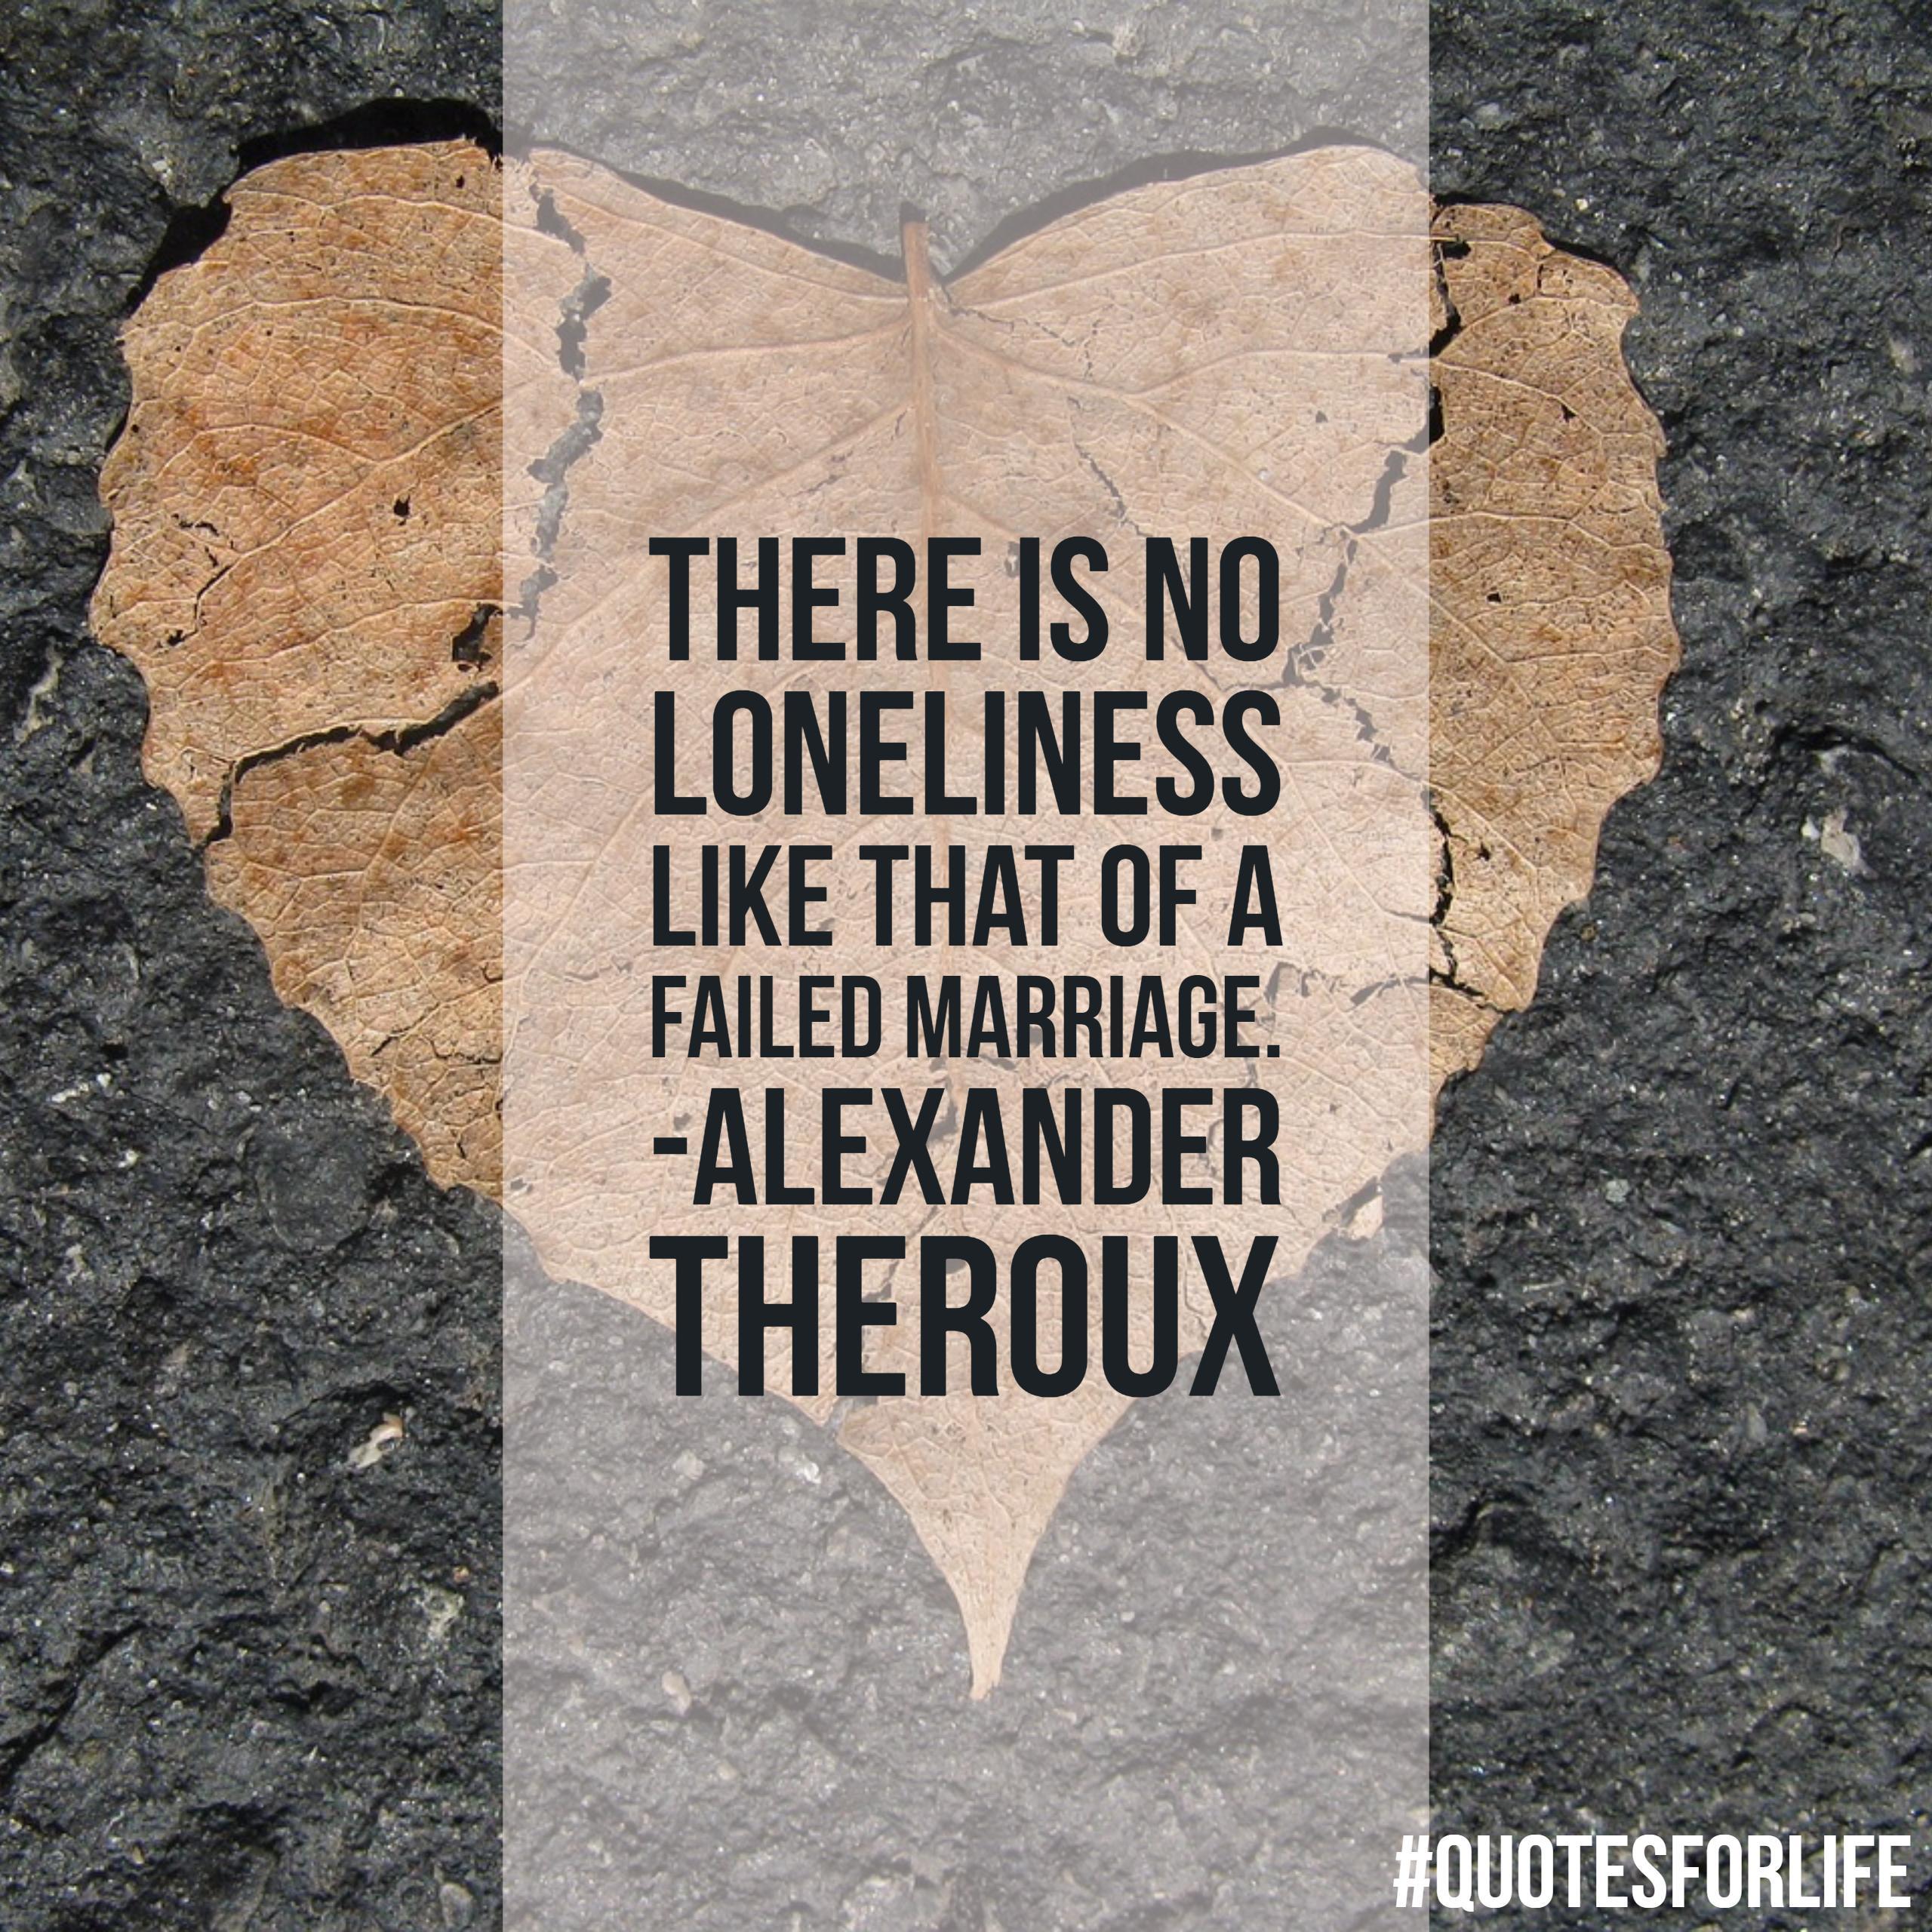 Alexander Theroux